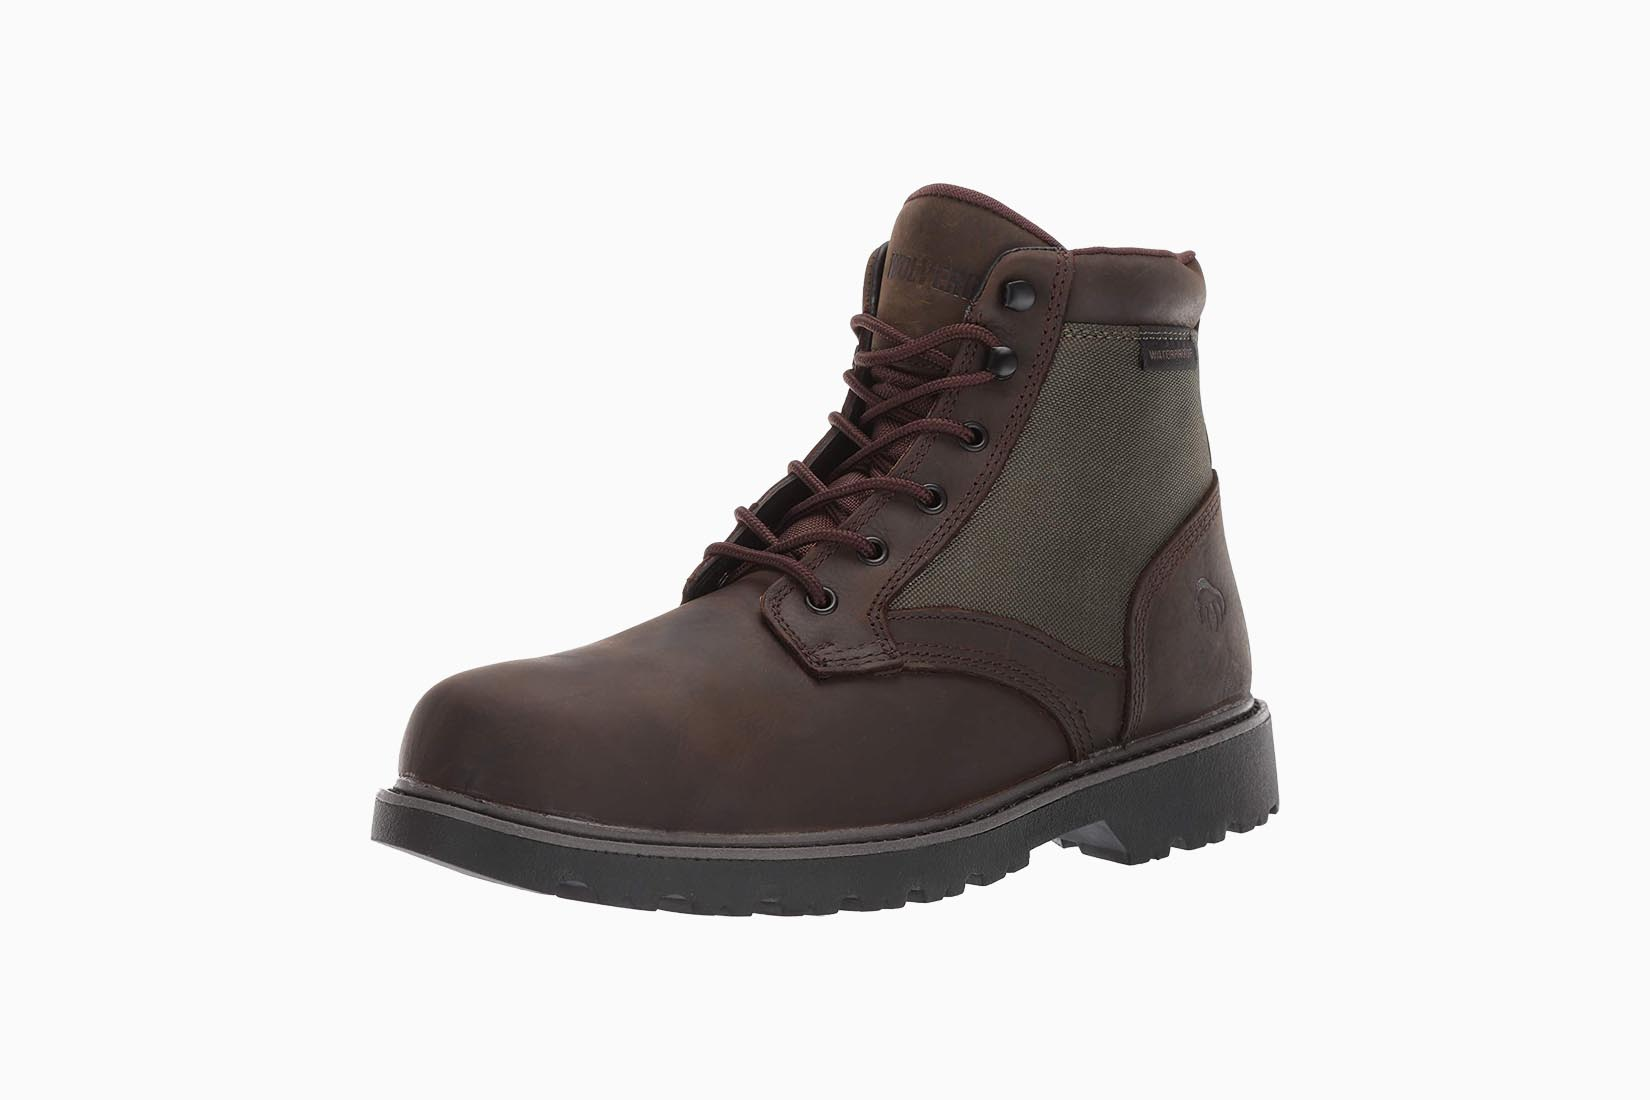 best boots men wolverine field boots review Luxe Digital